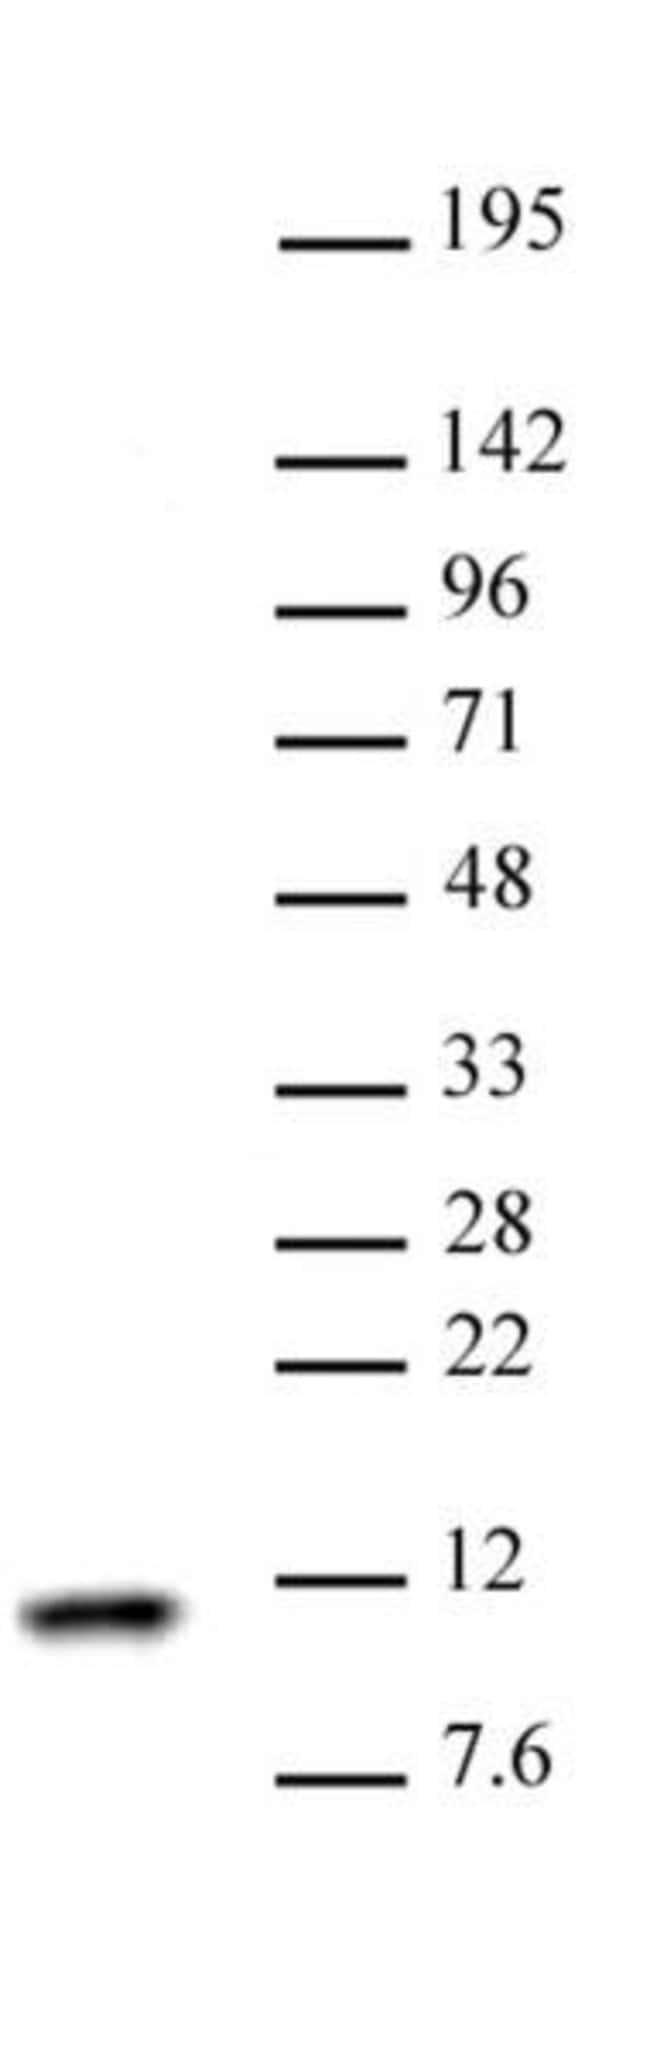 Histone H4 Rabbit anti-Human, Unconjugated, Polyclonal, Active Motif:Antibodies:Primary